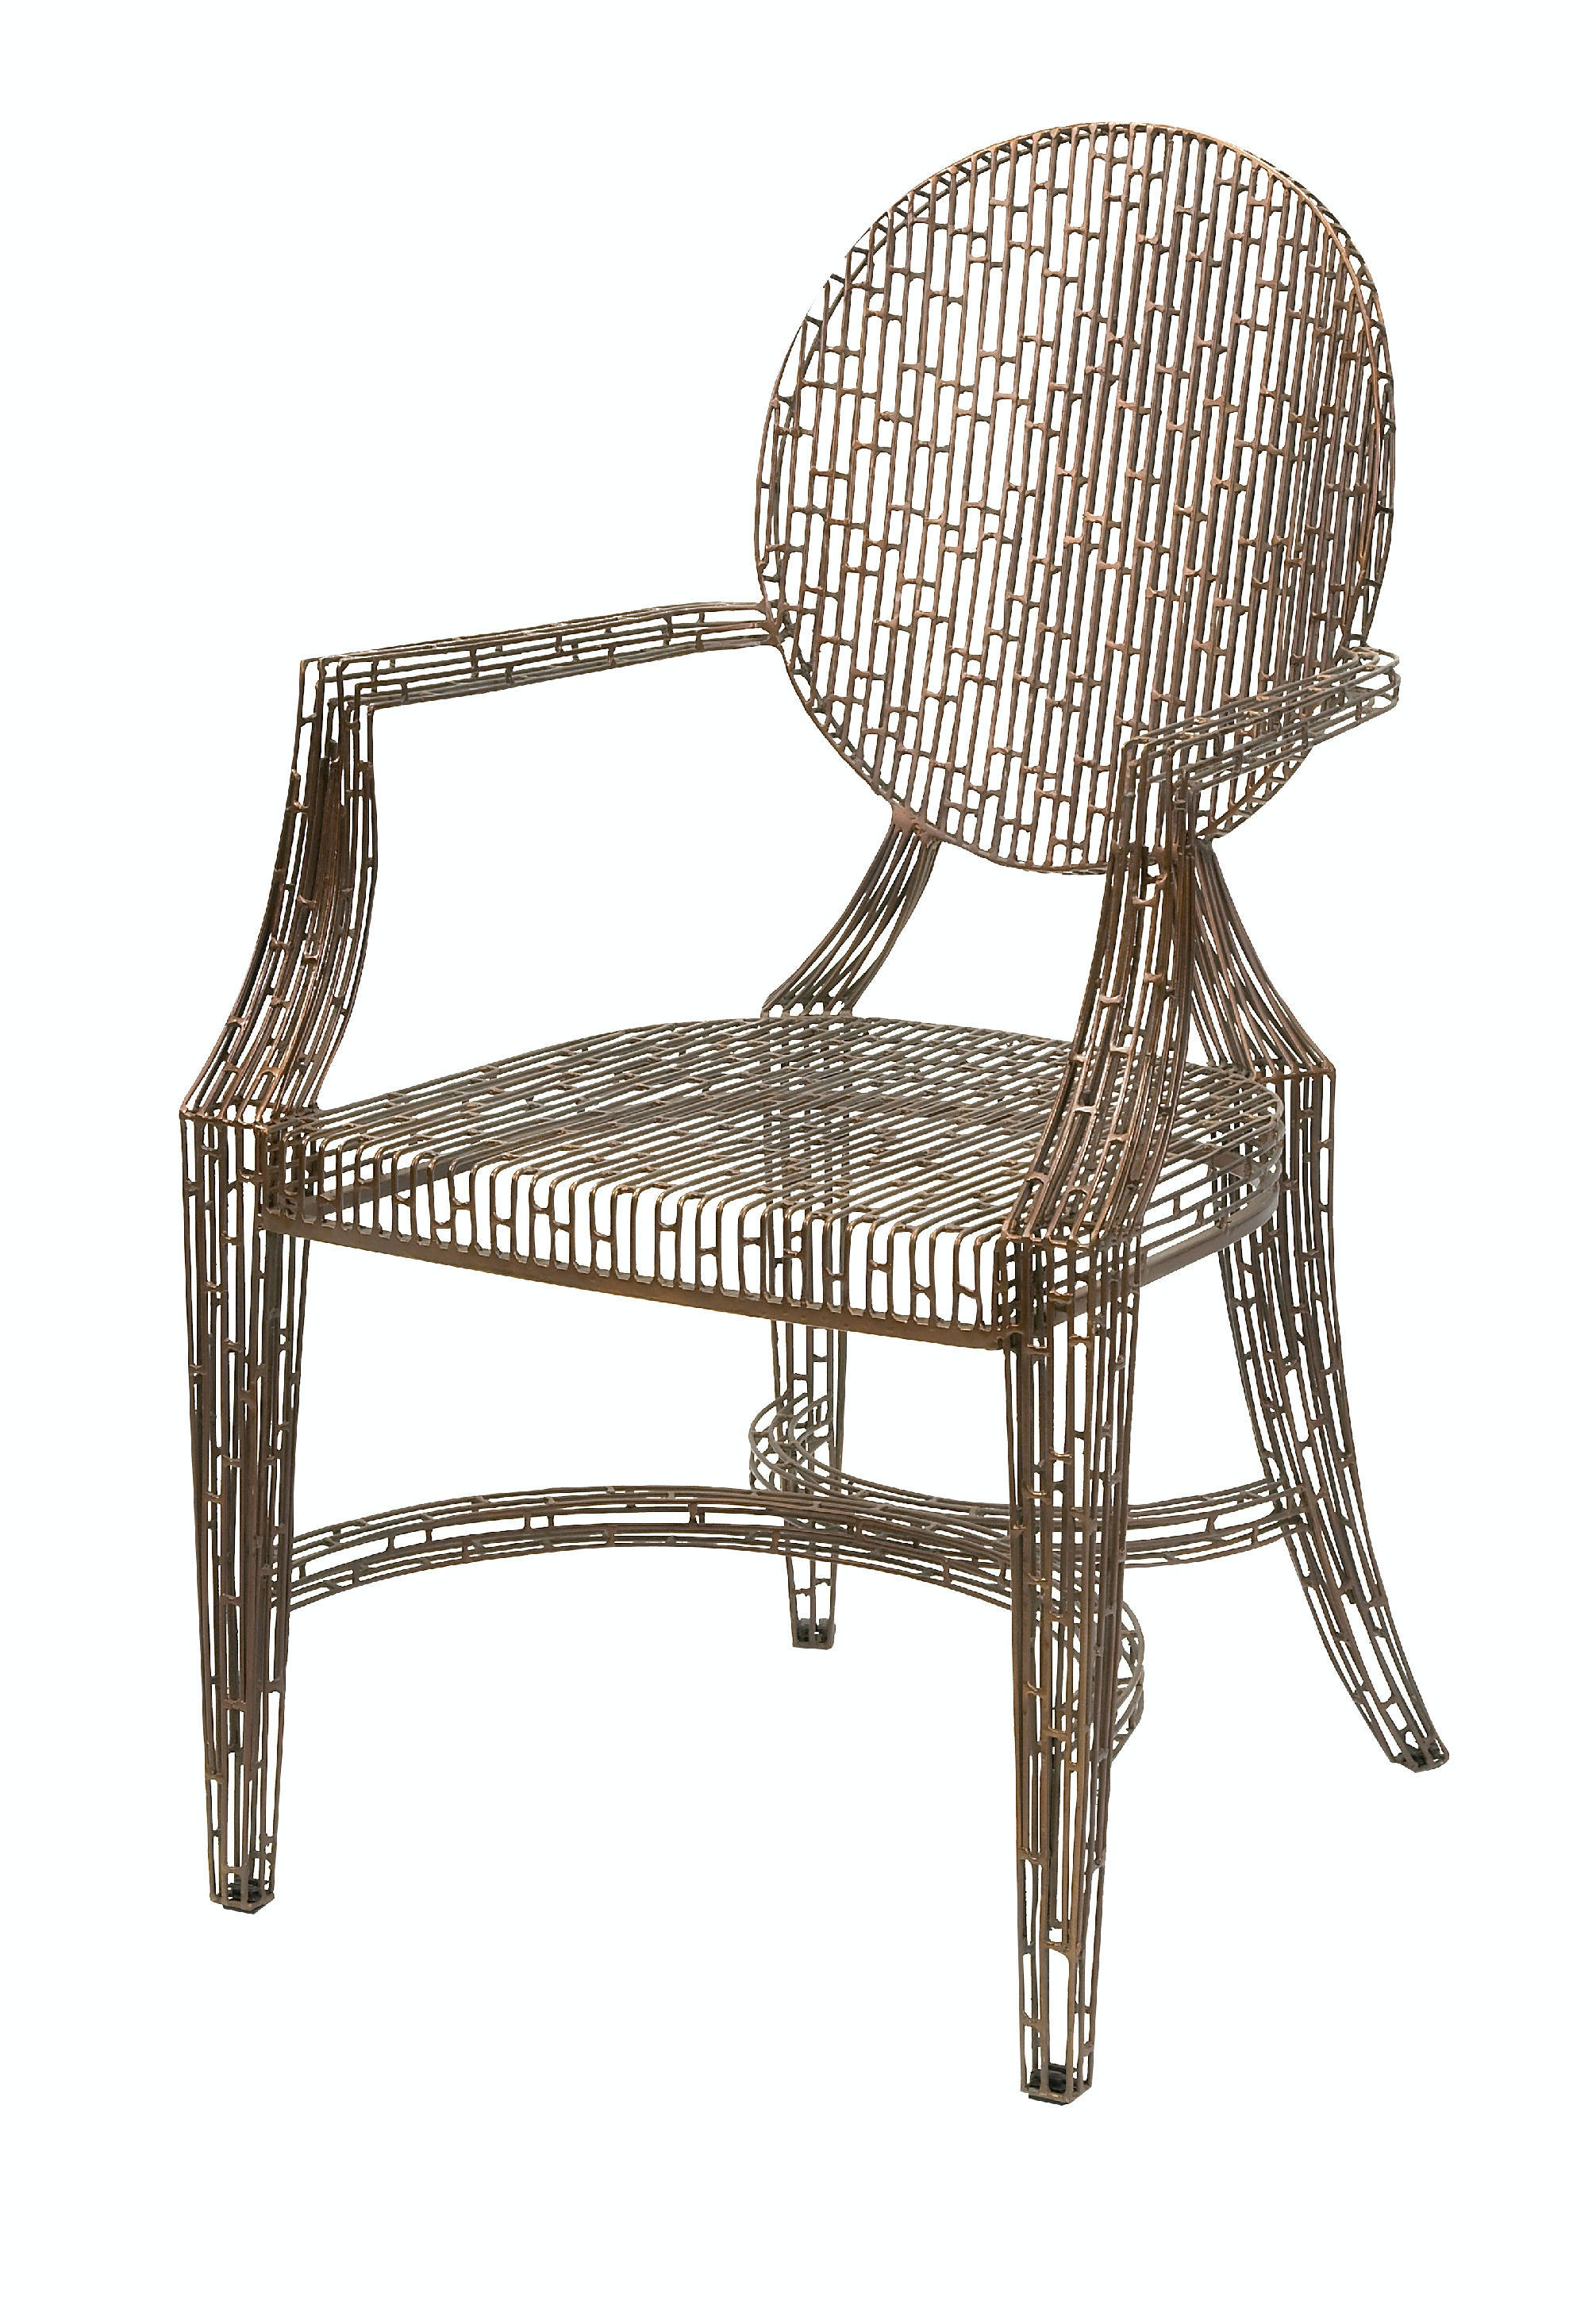 huntington chair corporation v rocker imax furniture carol house maryland wilkins handcrafted metal arm 11017